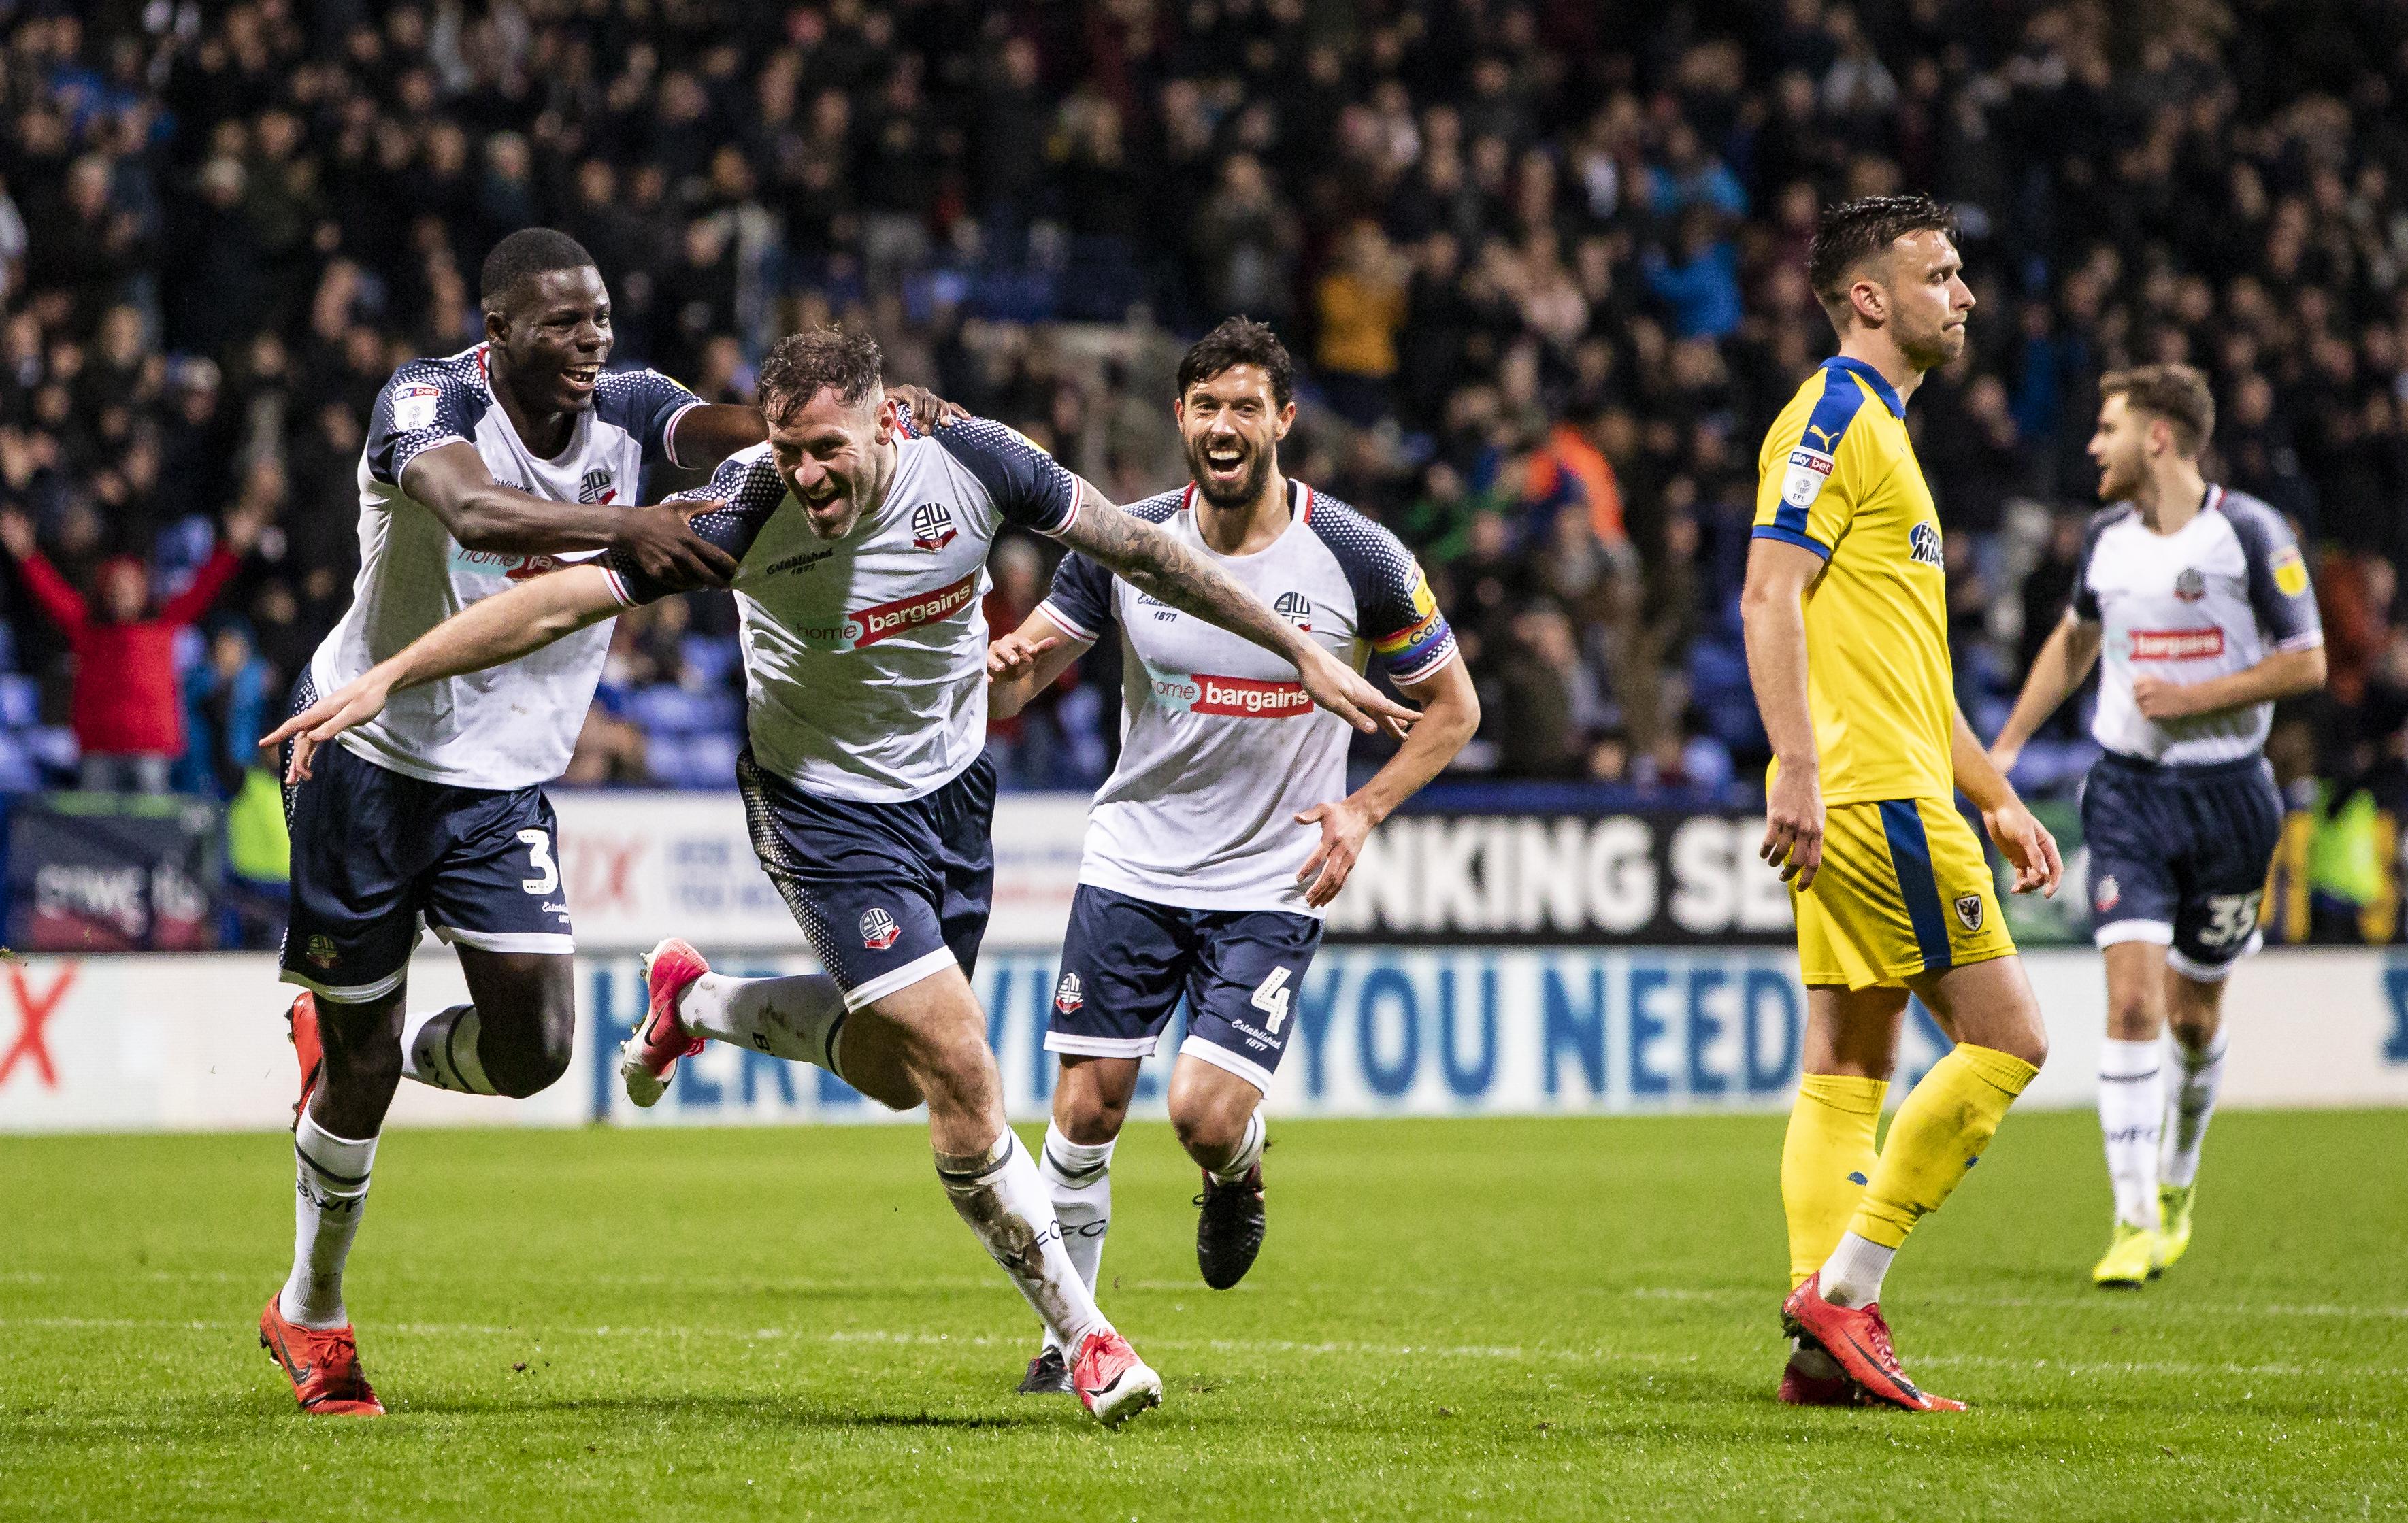 Bolton Wanderers v AFC Wimbledon - Sky Bet League One